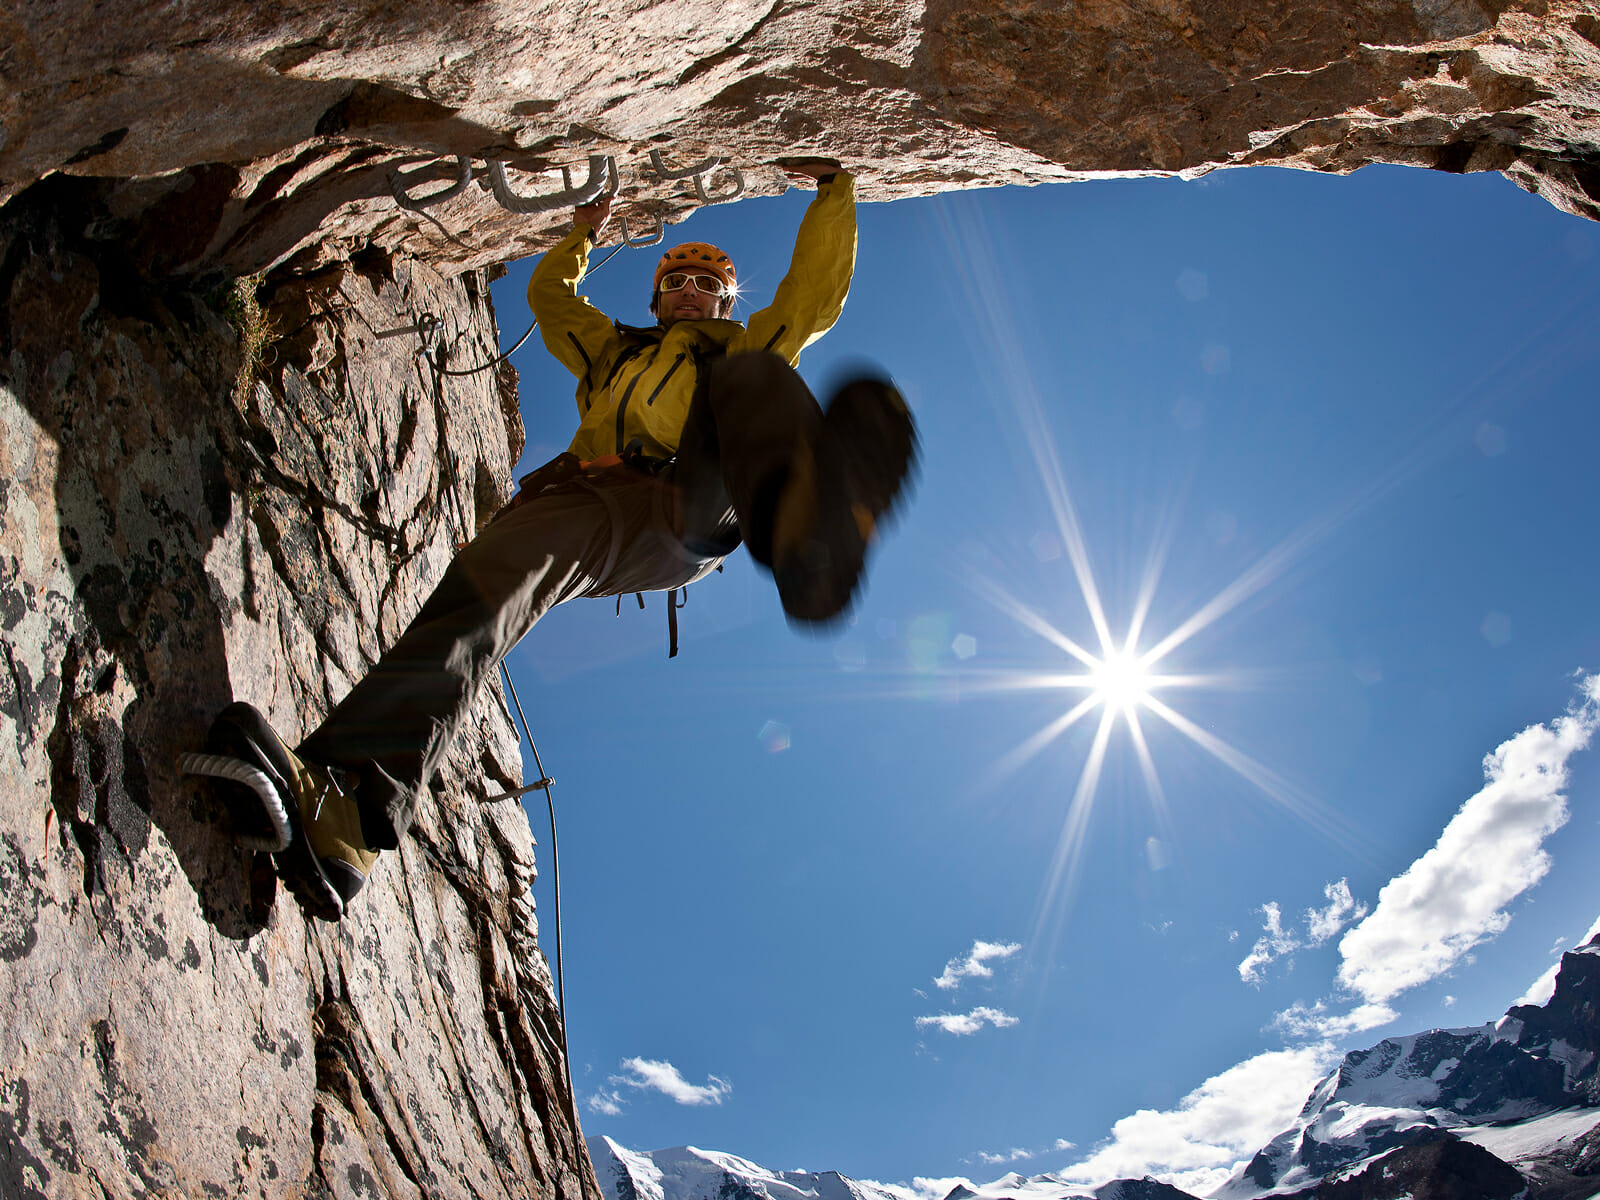 Klettersteig Liechtenstein : Walser klettersteig bergschule kleinwalsertal